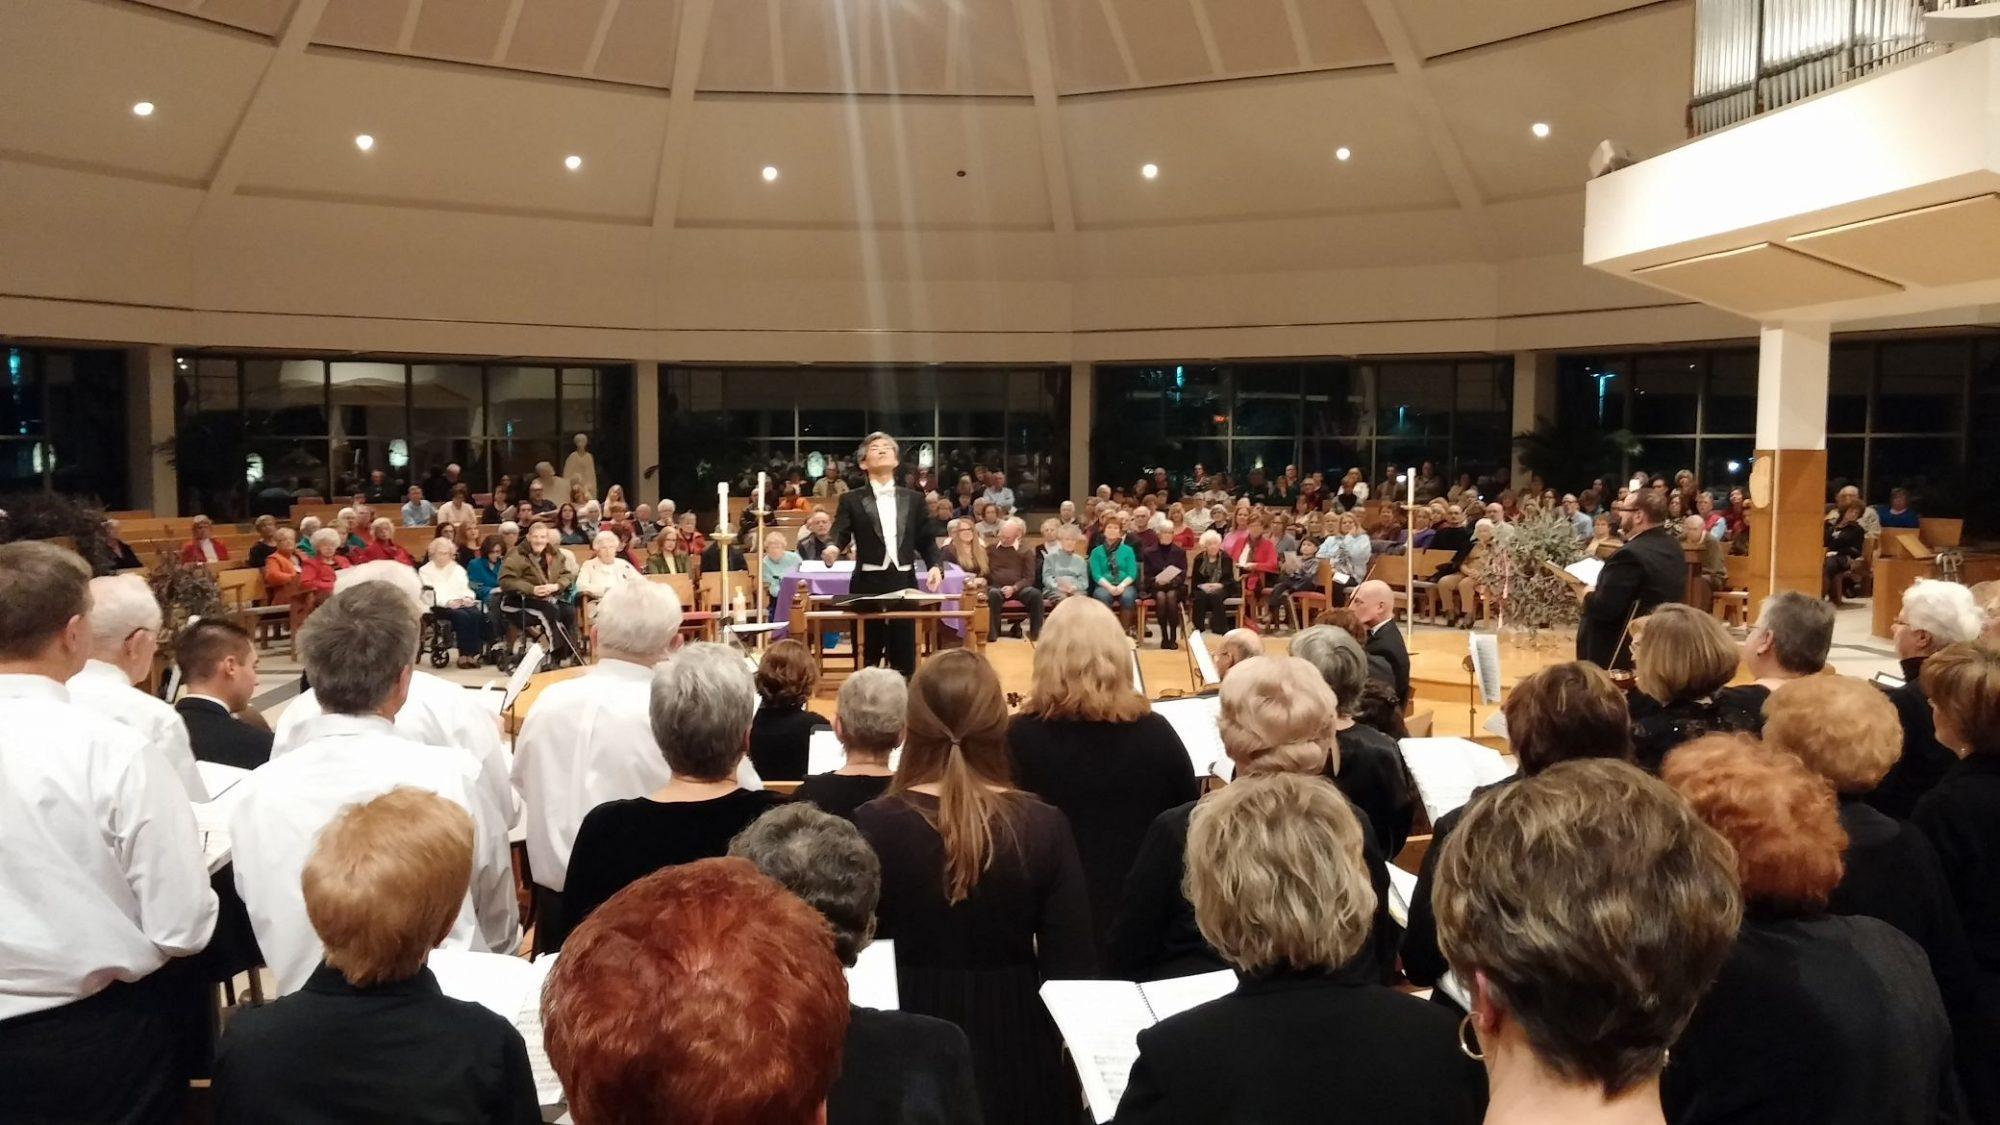 The Warren Civic Chorus